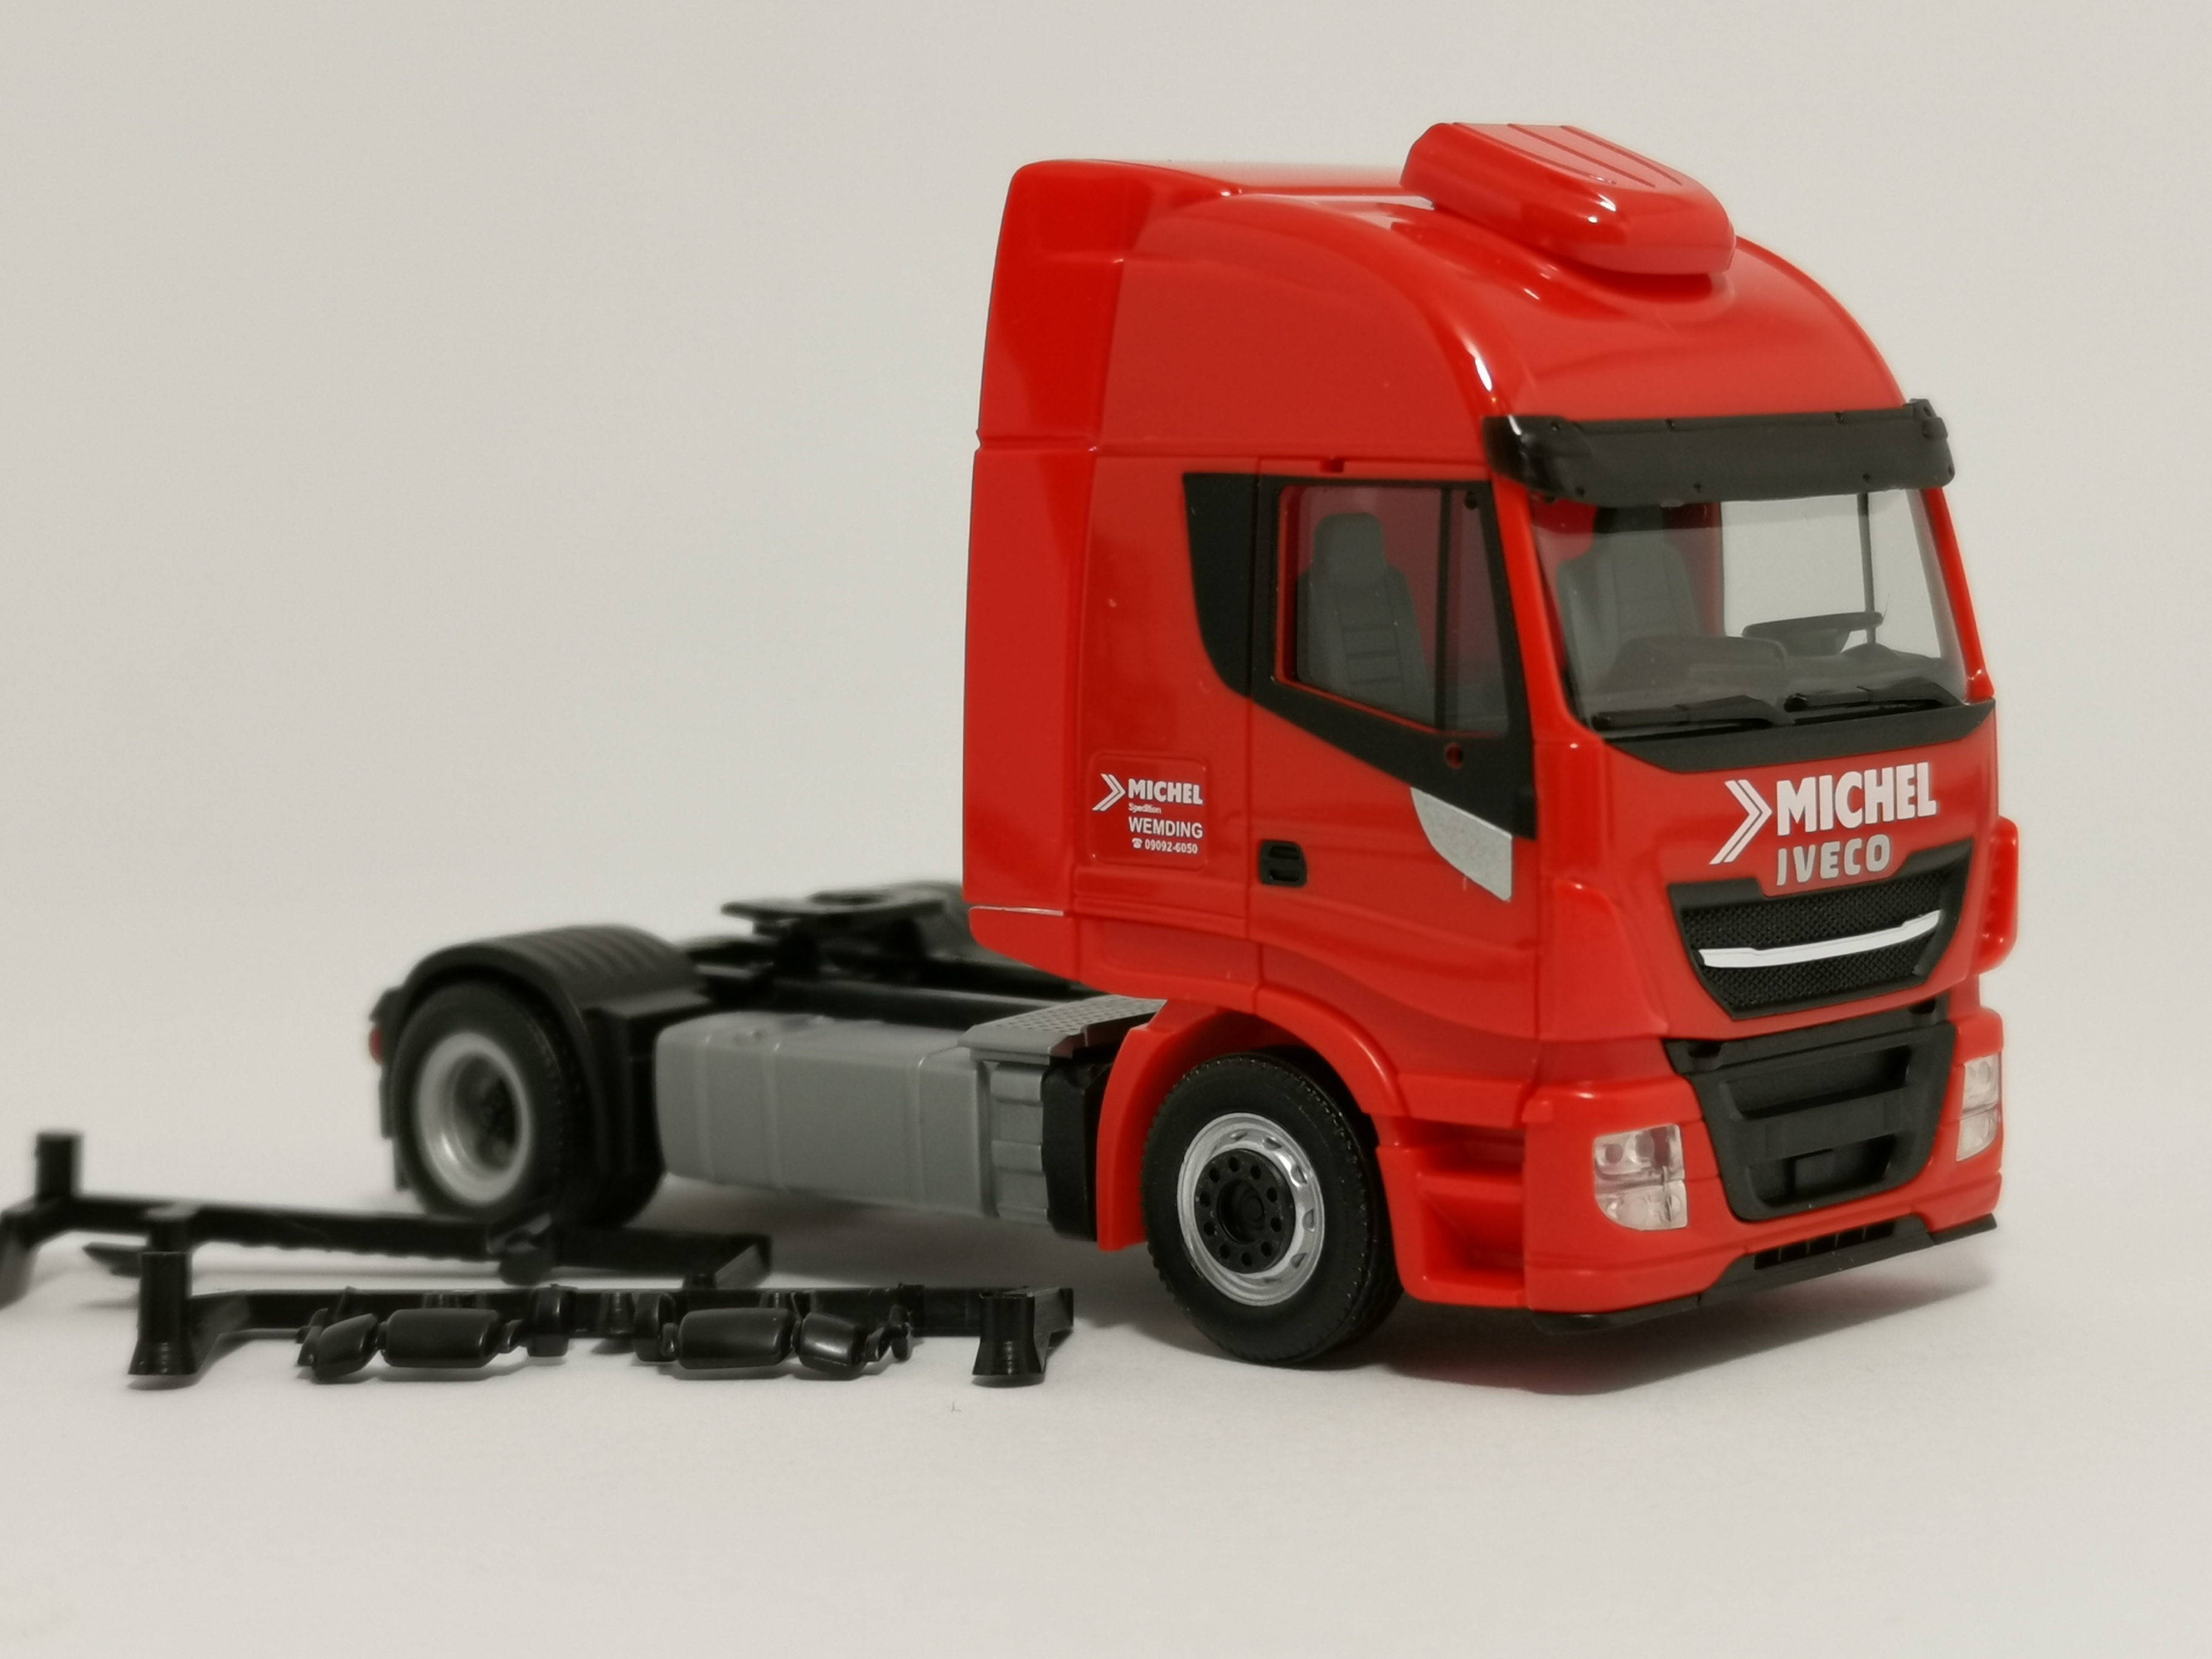 310031 Iveco starlis hiway XP michel Spedition GmbH 86650 wemding desde modelo